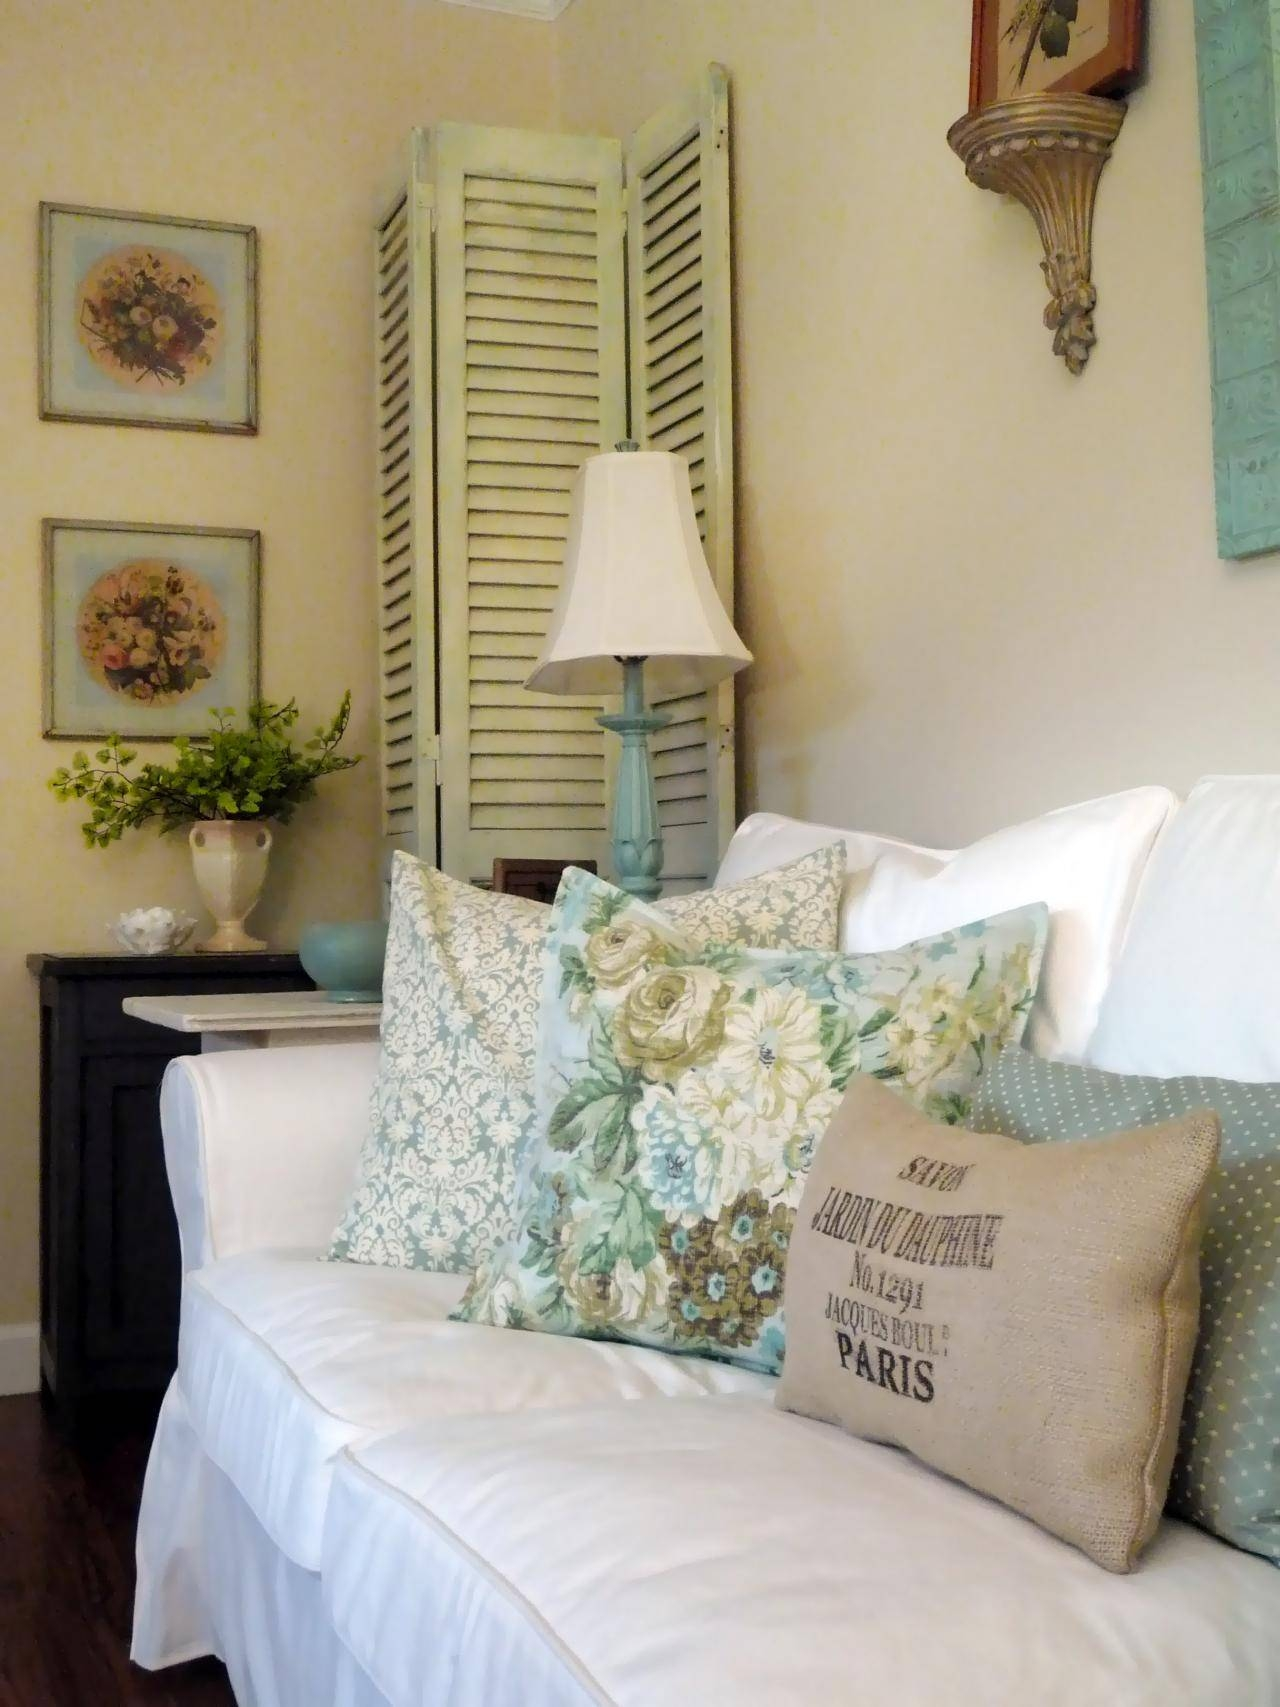 Bedroom : New Pure White Shabby Chic Interior Fur Sofa Slipcover Inside Shabby Chic Window Mirrors (View 6 of 25)